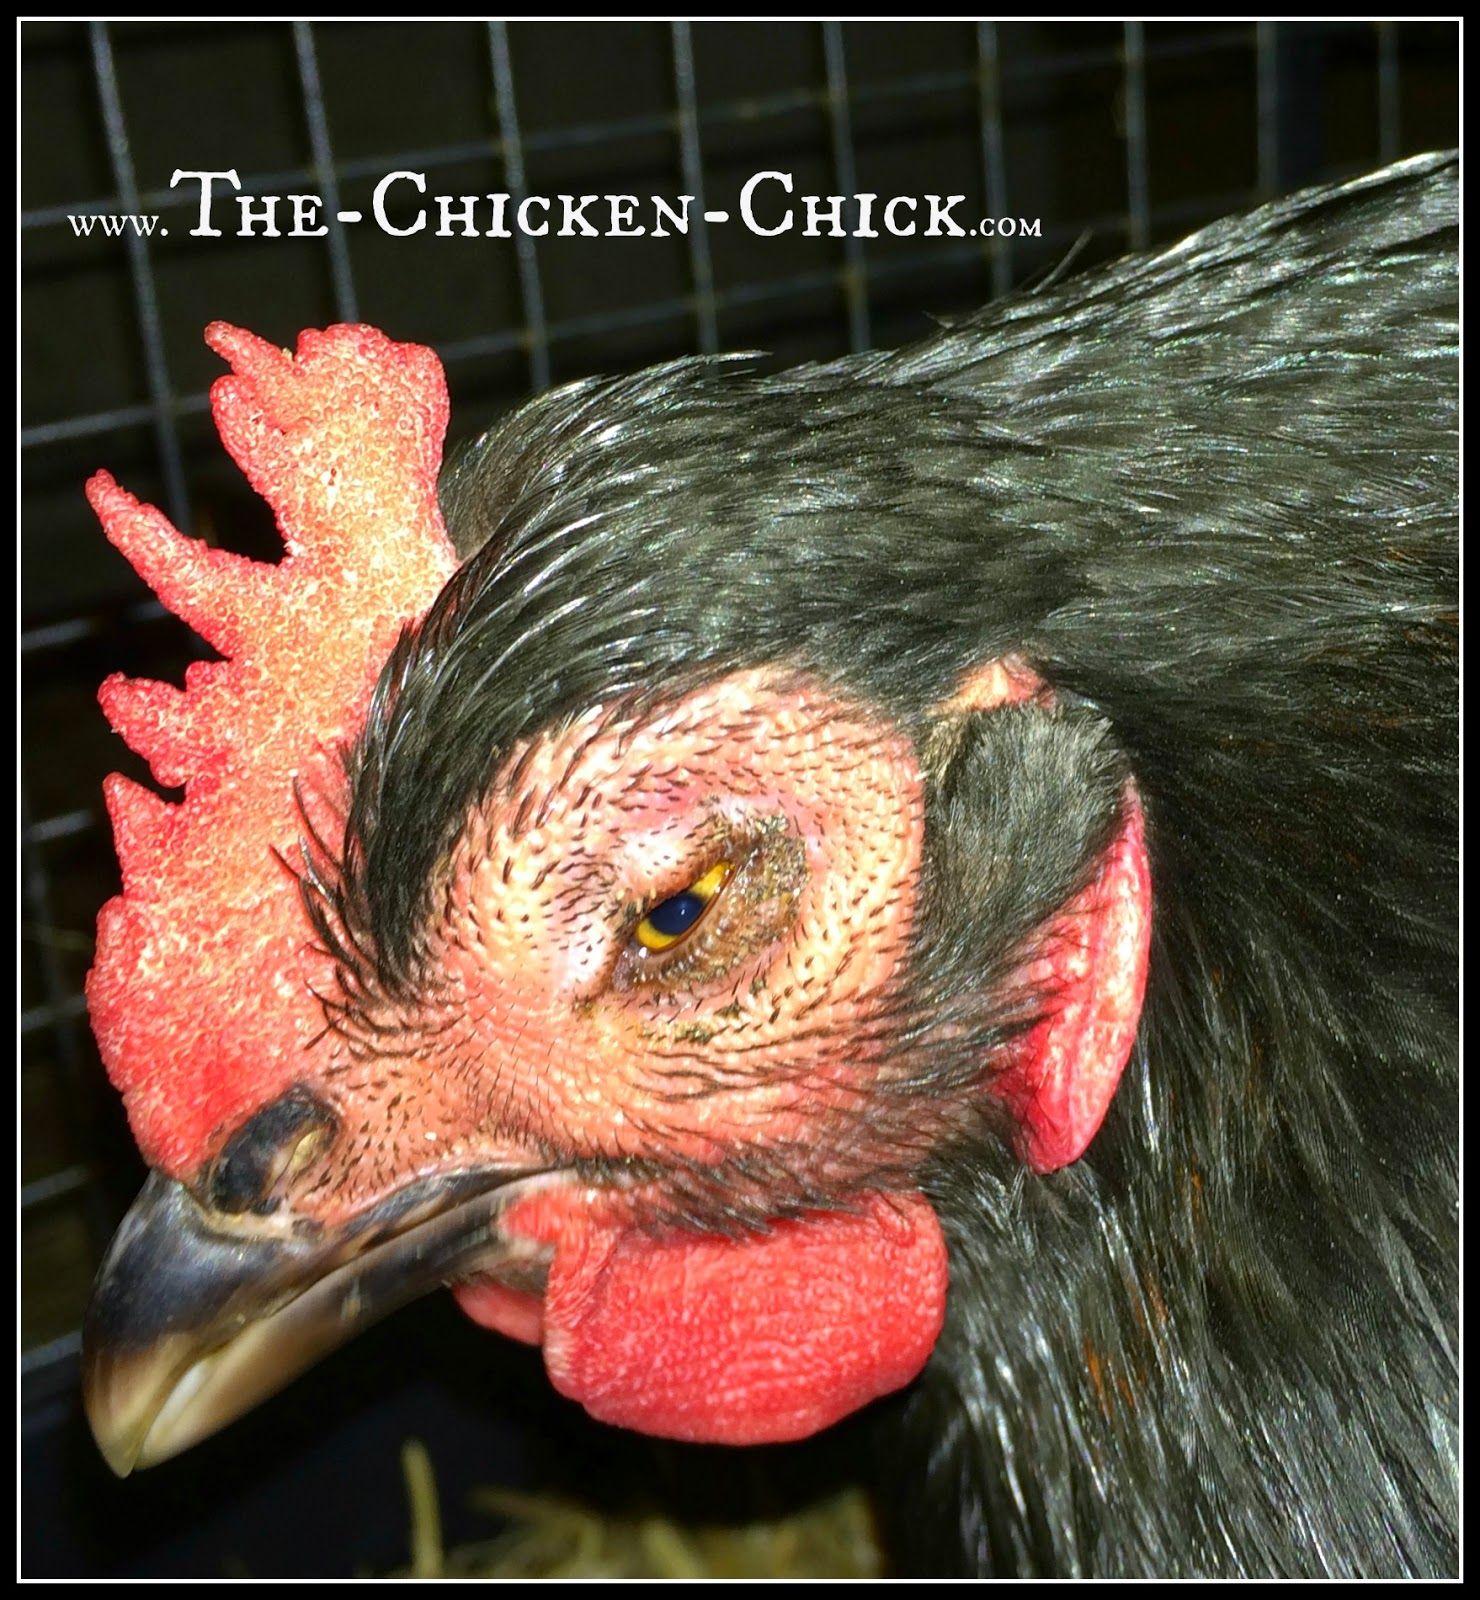 Backyard Chickens & Avian Influenza What to Do About Bird Flu